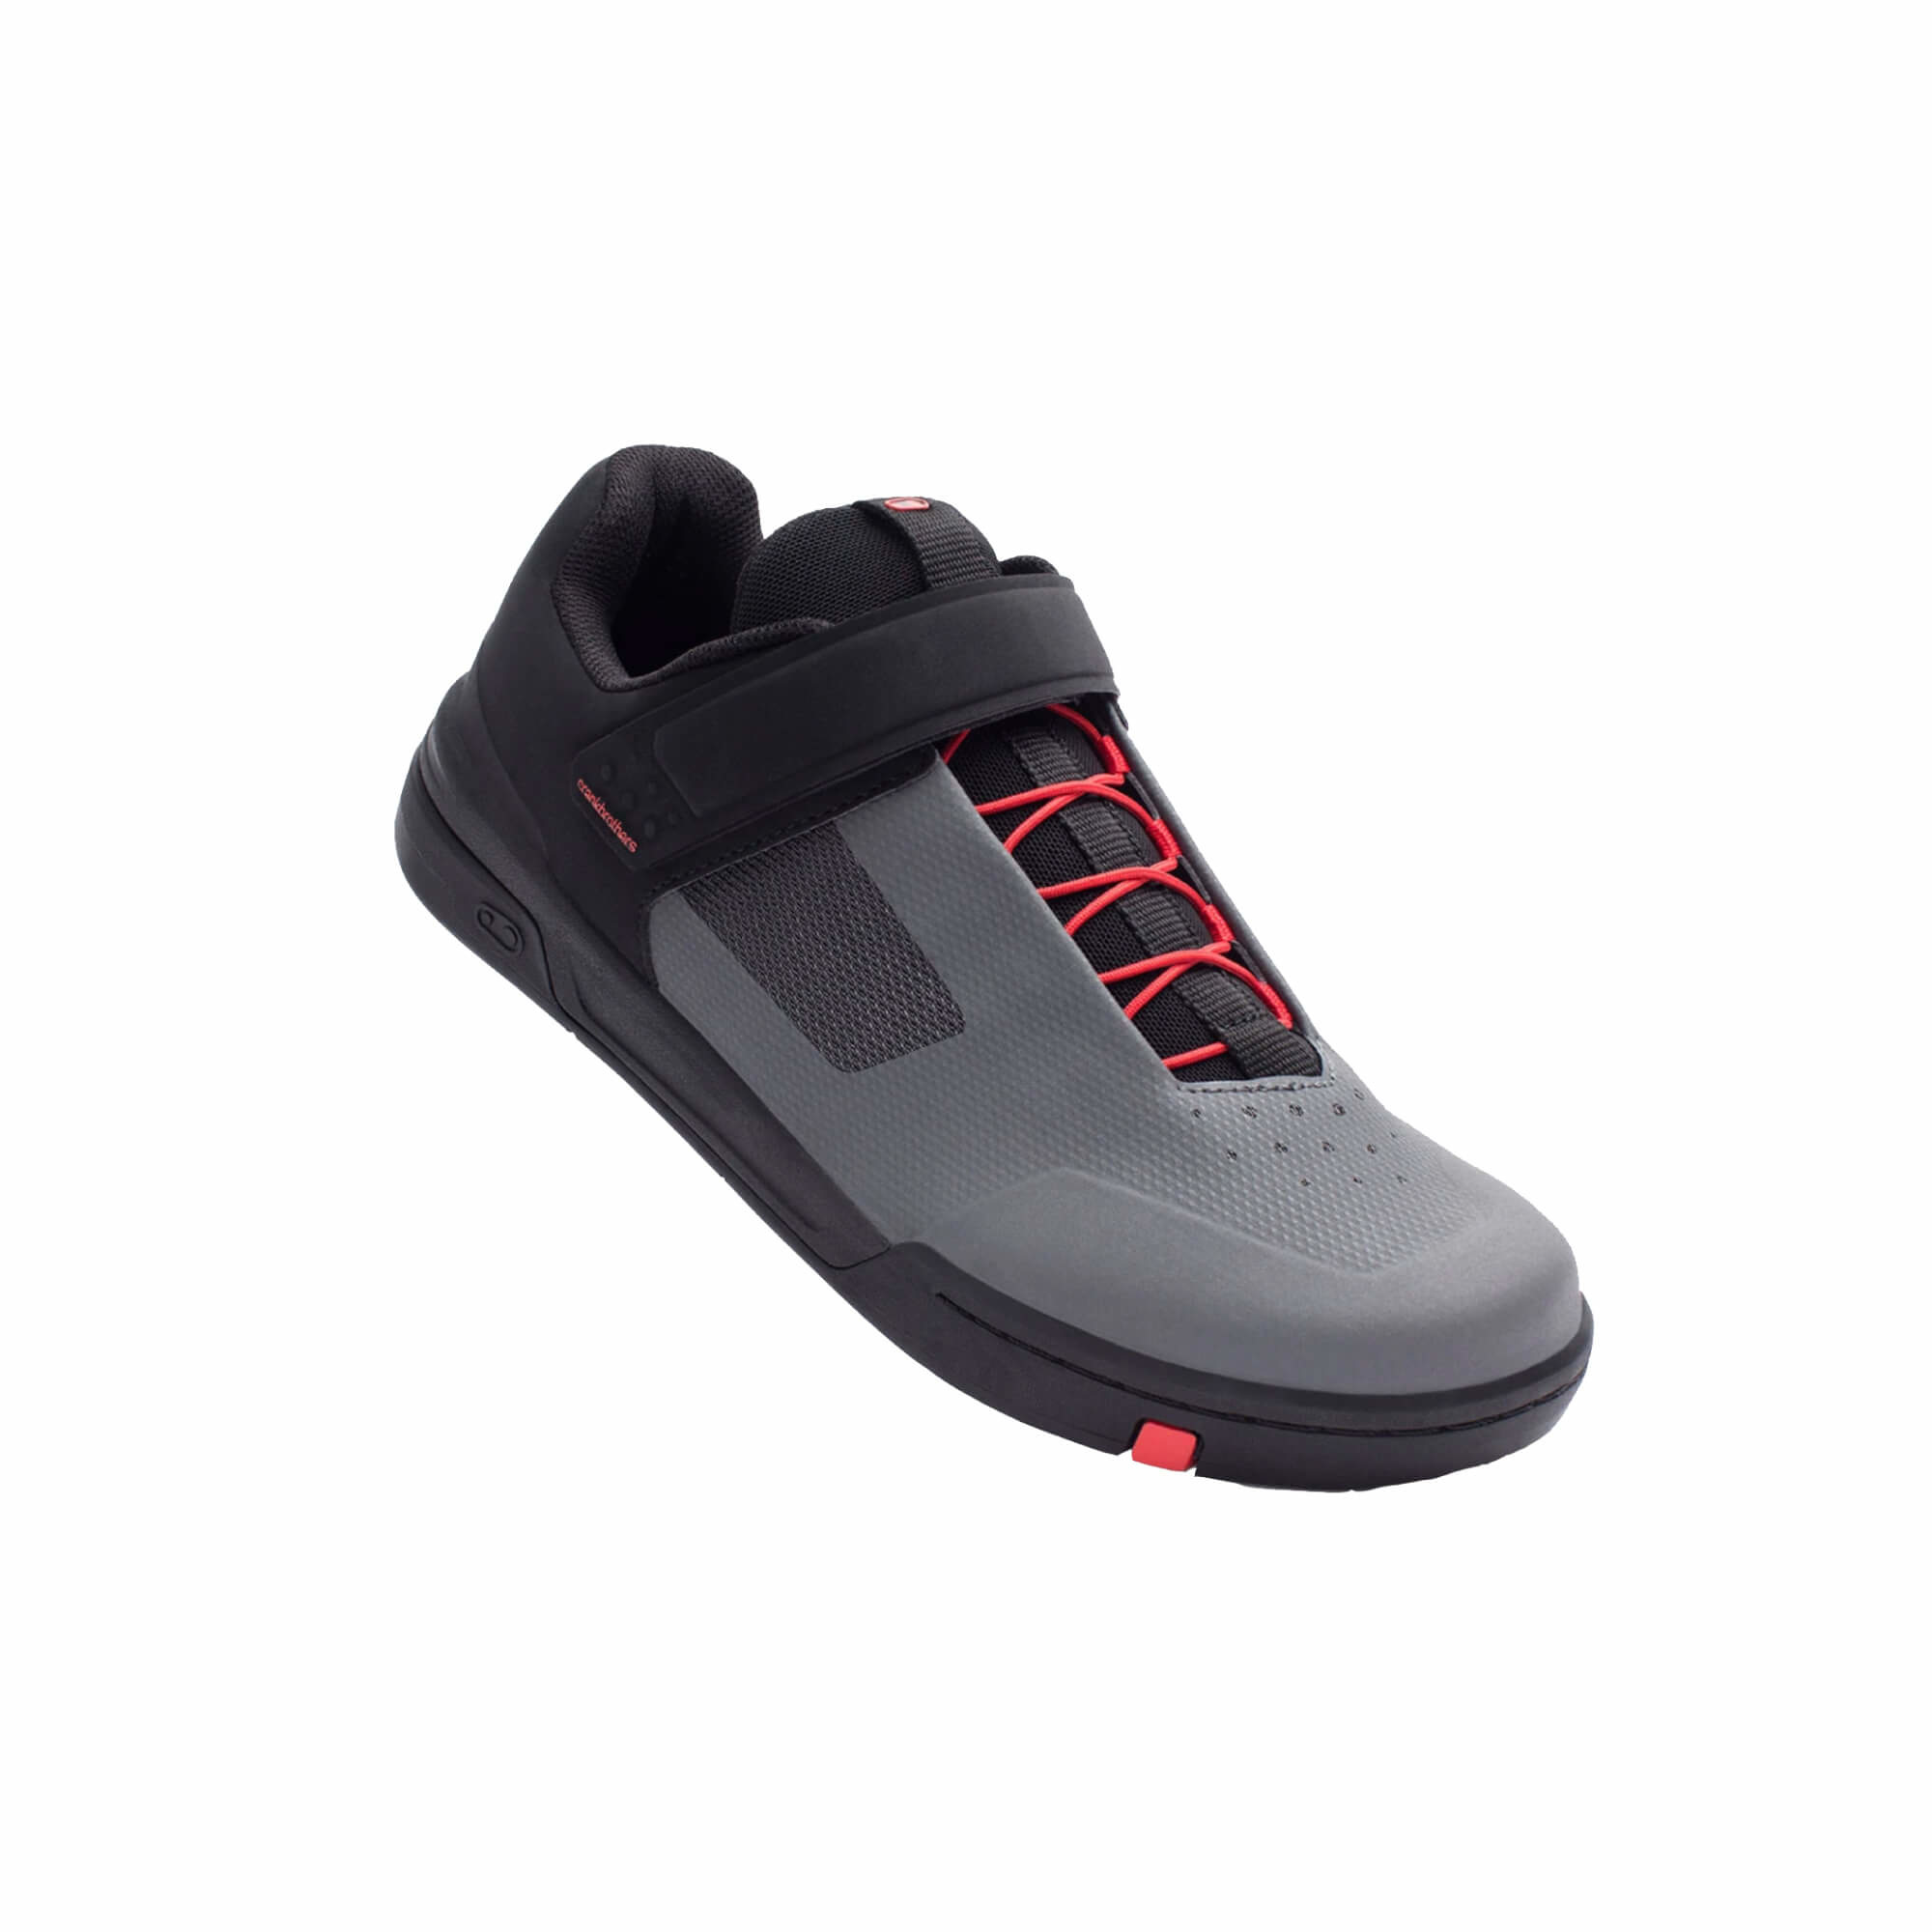 Shoes Stamp Speedlace Flat-3